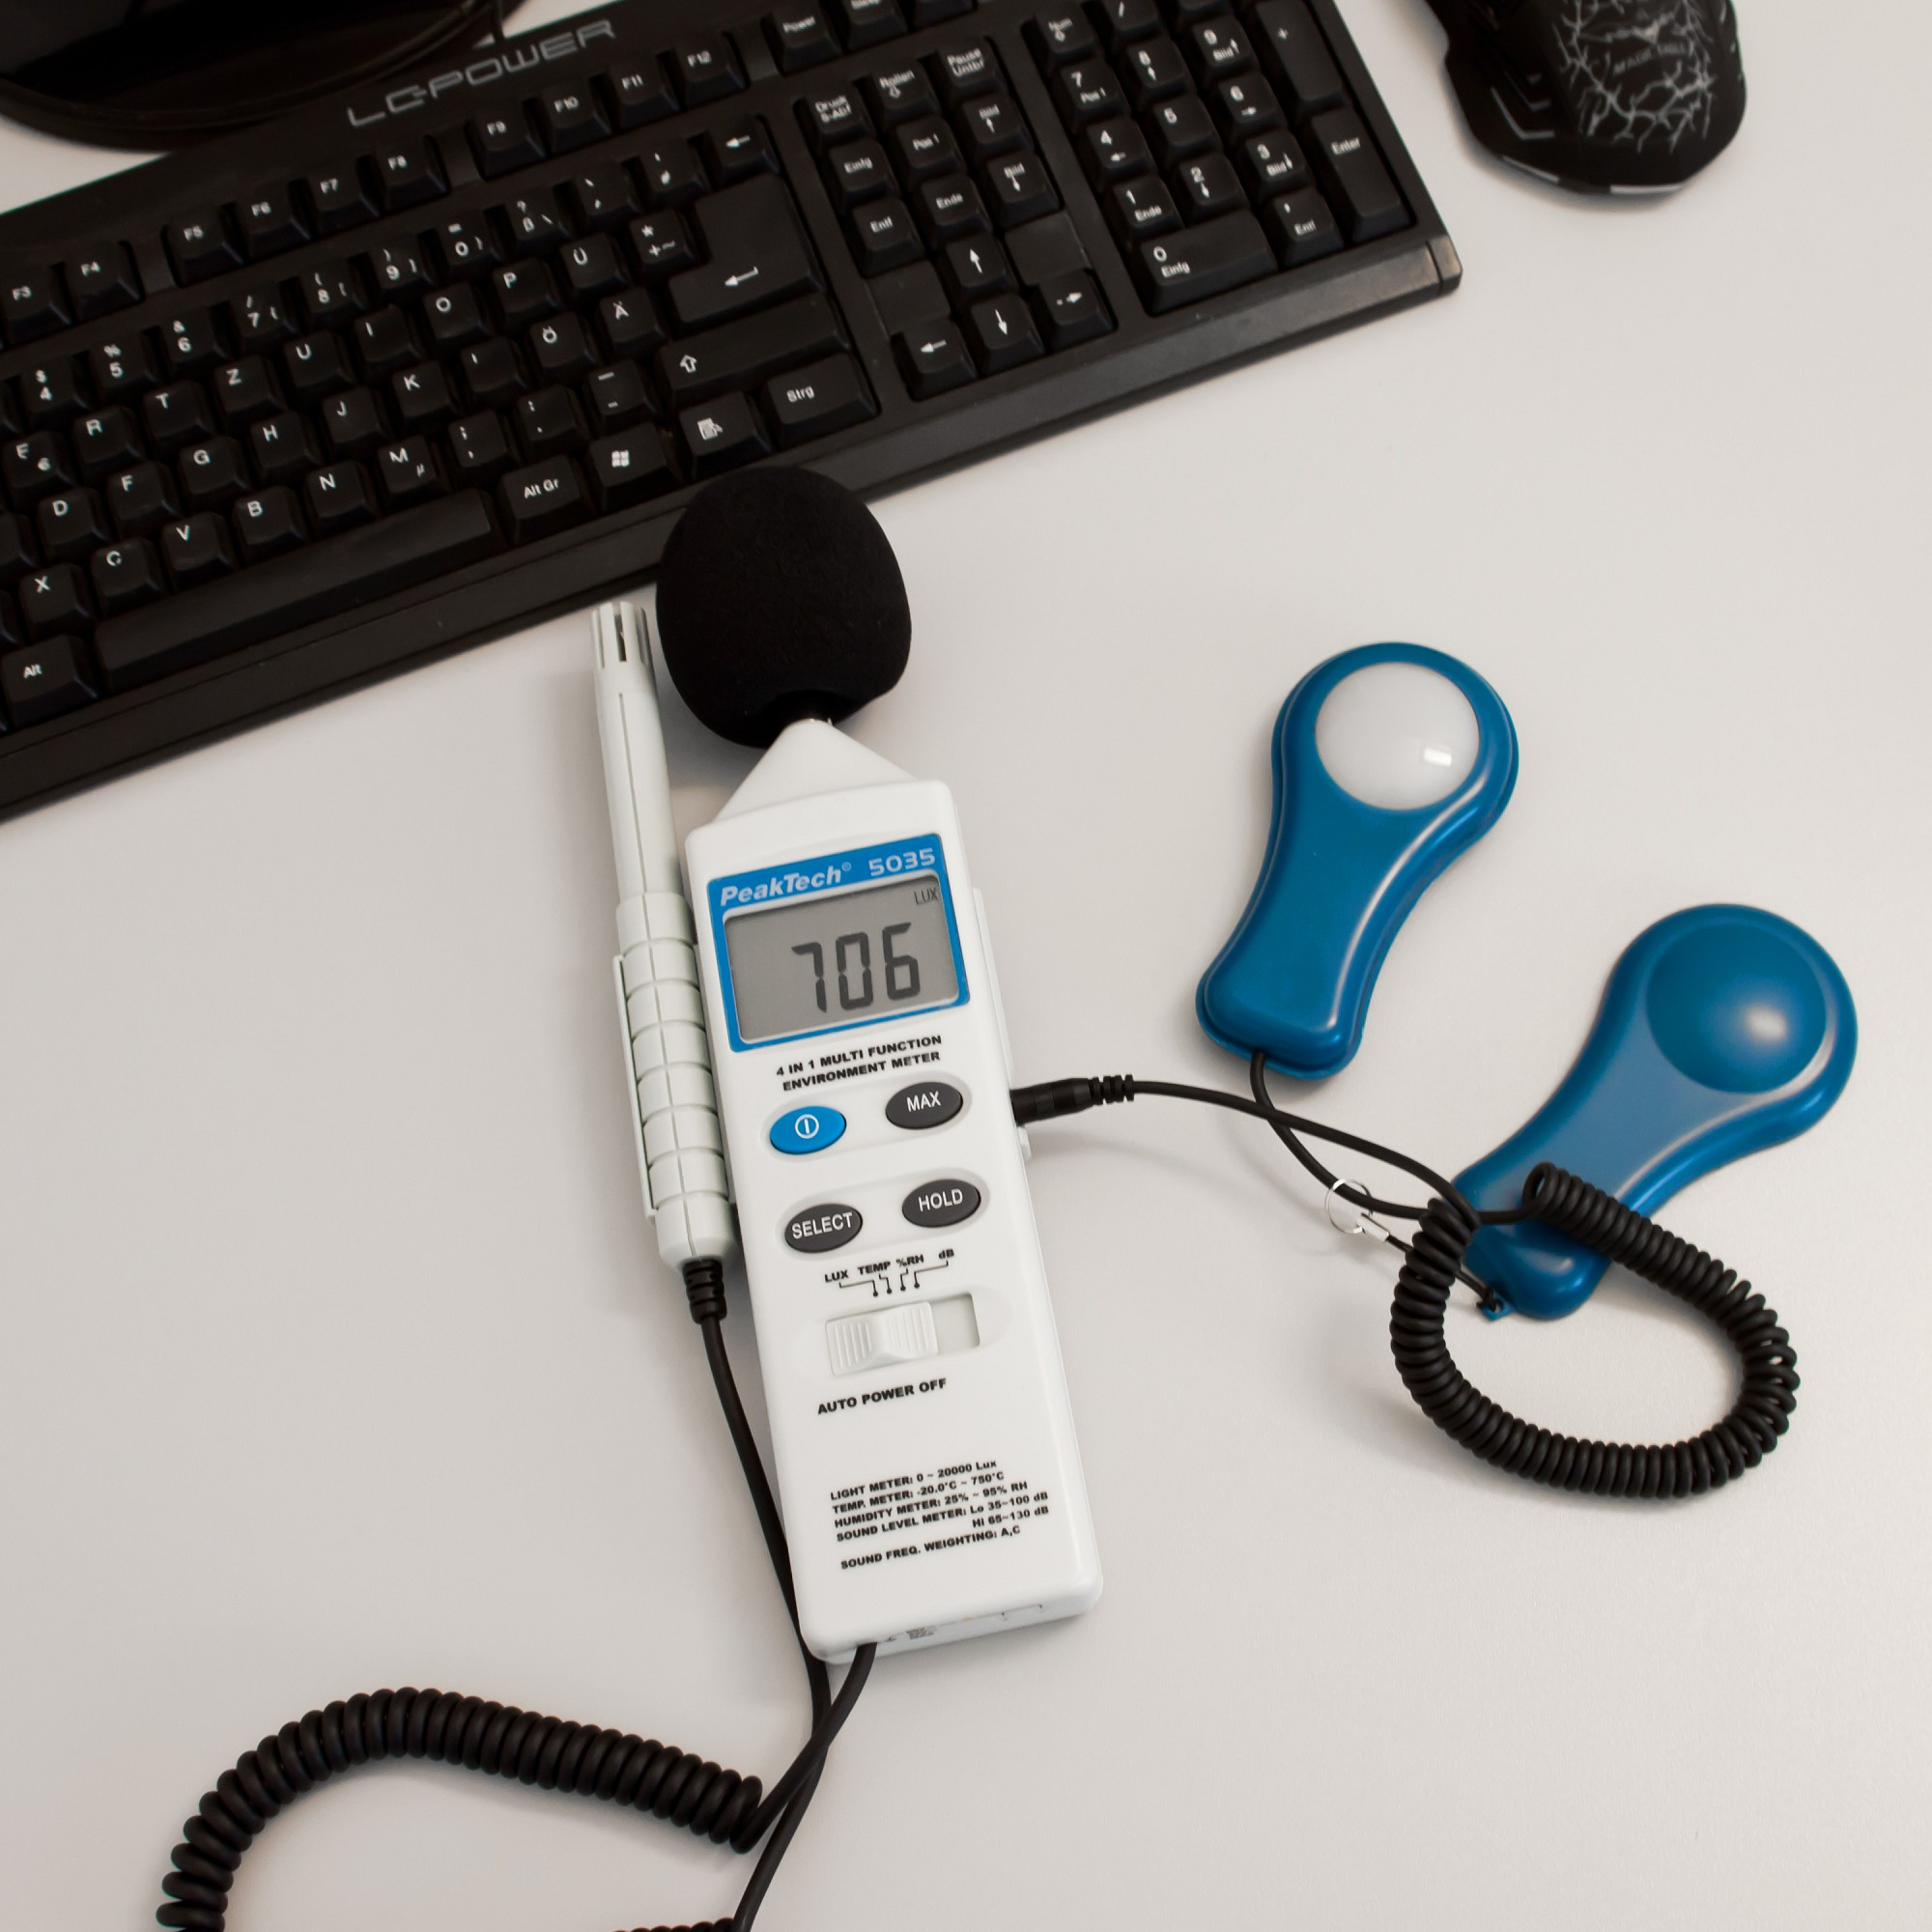 «PeakTech® P 5035» Multifunction environment tester